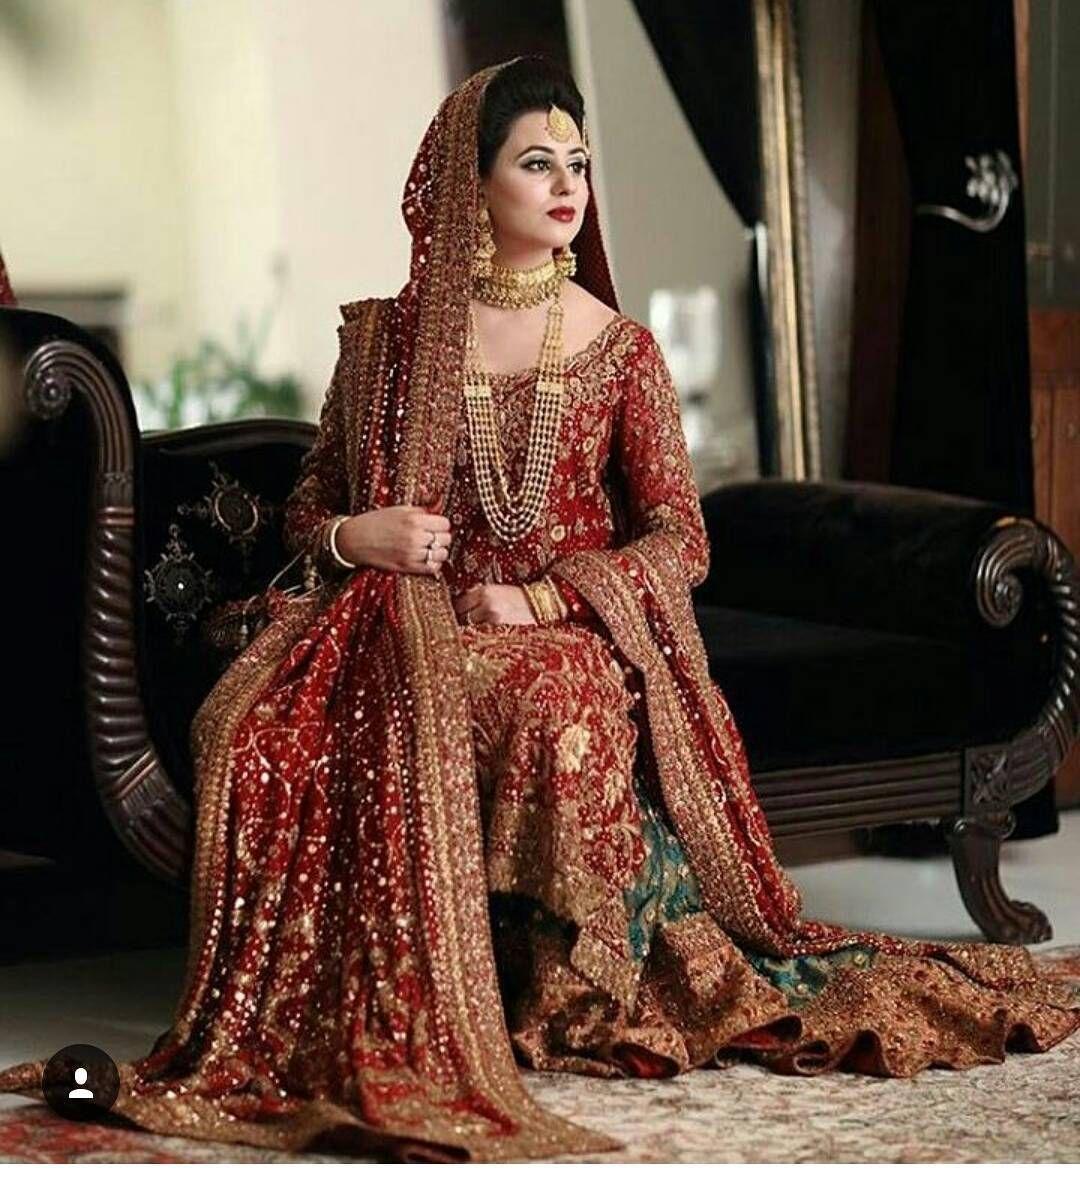 ❤ looking beautiful in #treditionallook  Instagram follow @desibridel  #repost #indianweddings #makeup  #dulhan  #fashionweek  #photography #lollywood #bollywood #tollywood #kollywood  #actress #pakistanibride #lahanga #desistyle #cleavage #nude #bridaljwellary #indianculture #treditional #shadi #2017 #dishapatani #miss #missworld  #alia  #bridelmagazine #asianbride #erotic #bold Plz follow.